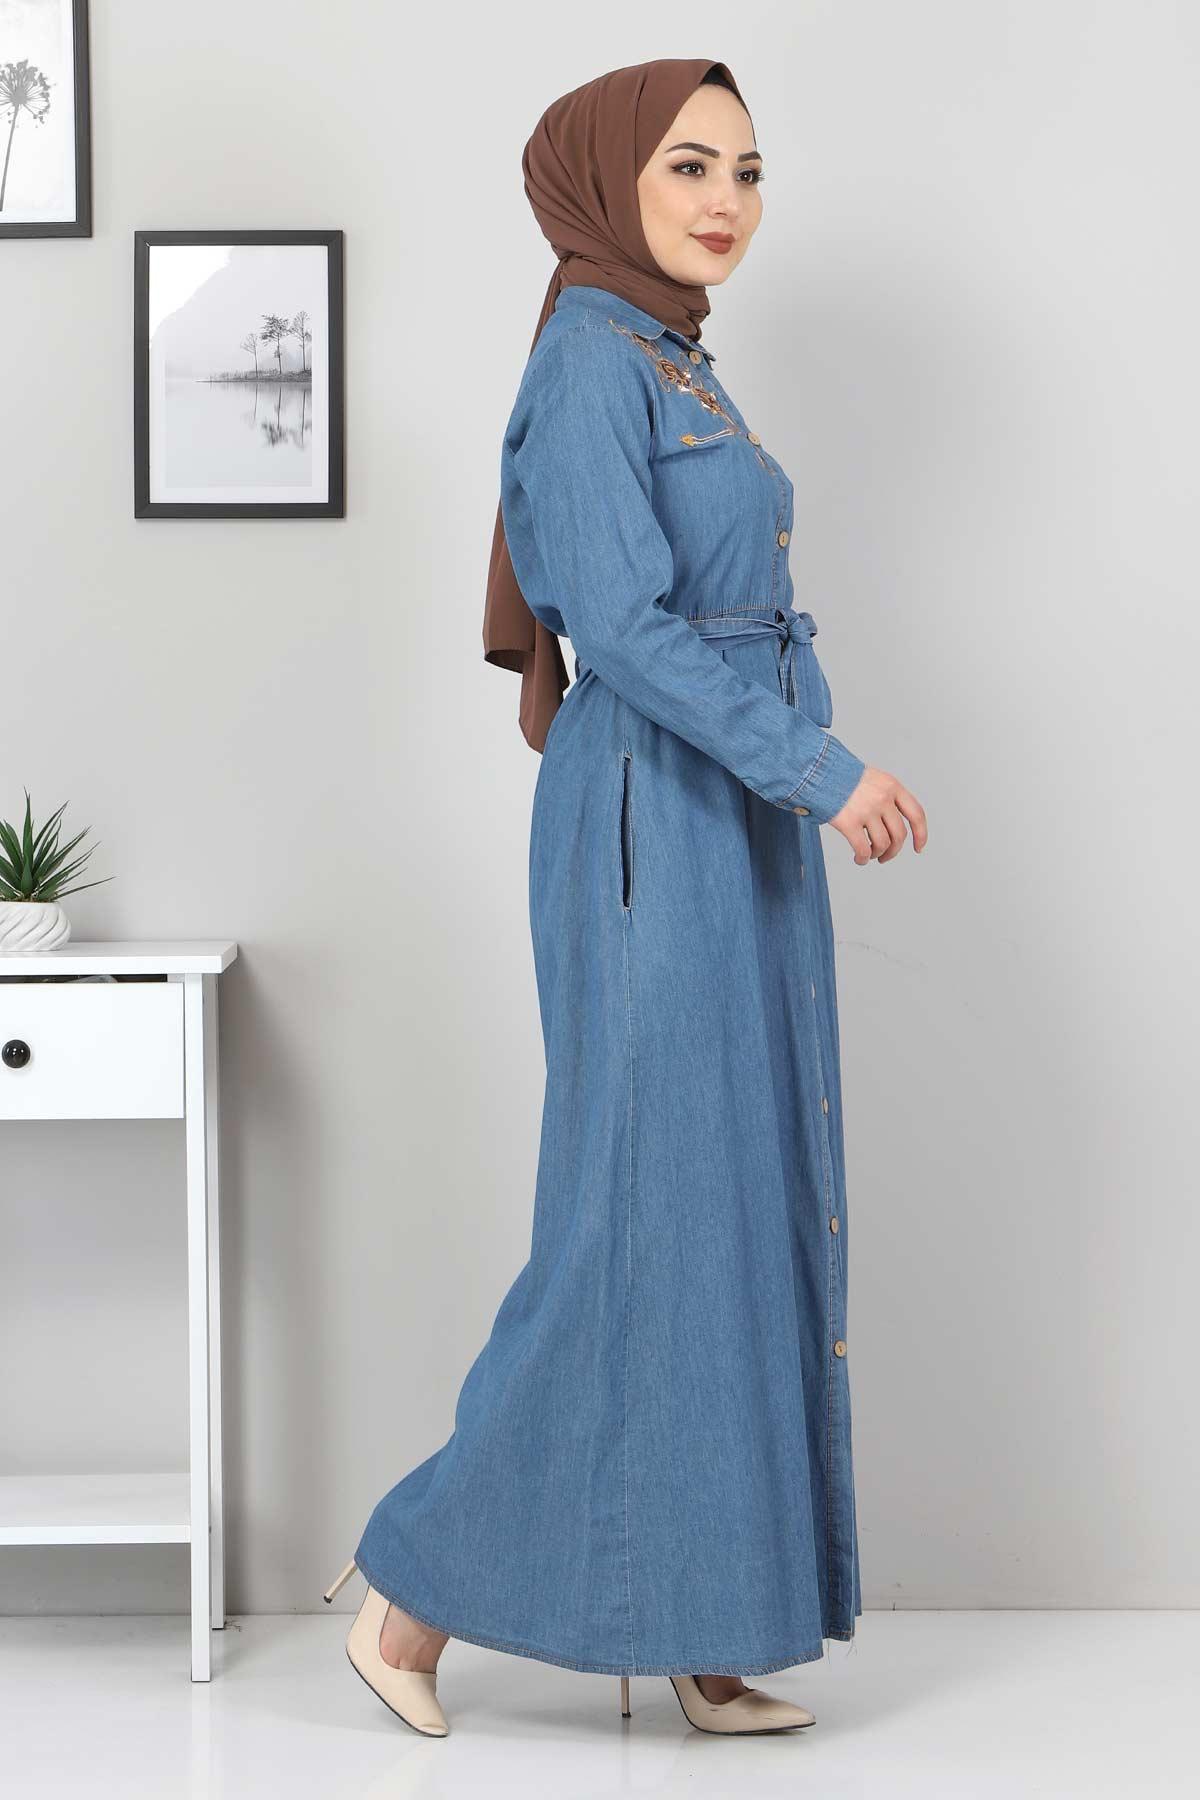 Nakışlı Kot Elbise TSD0355 Açık Mavi